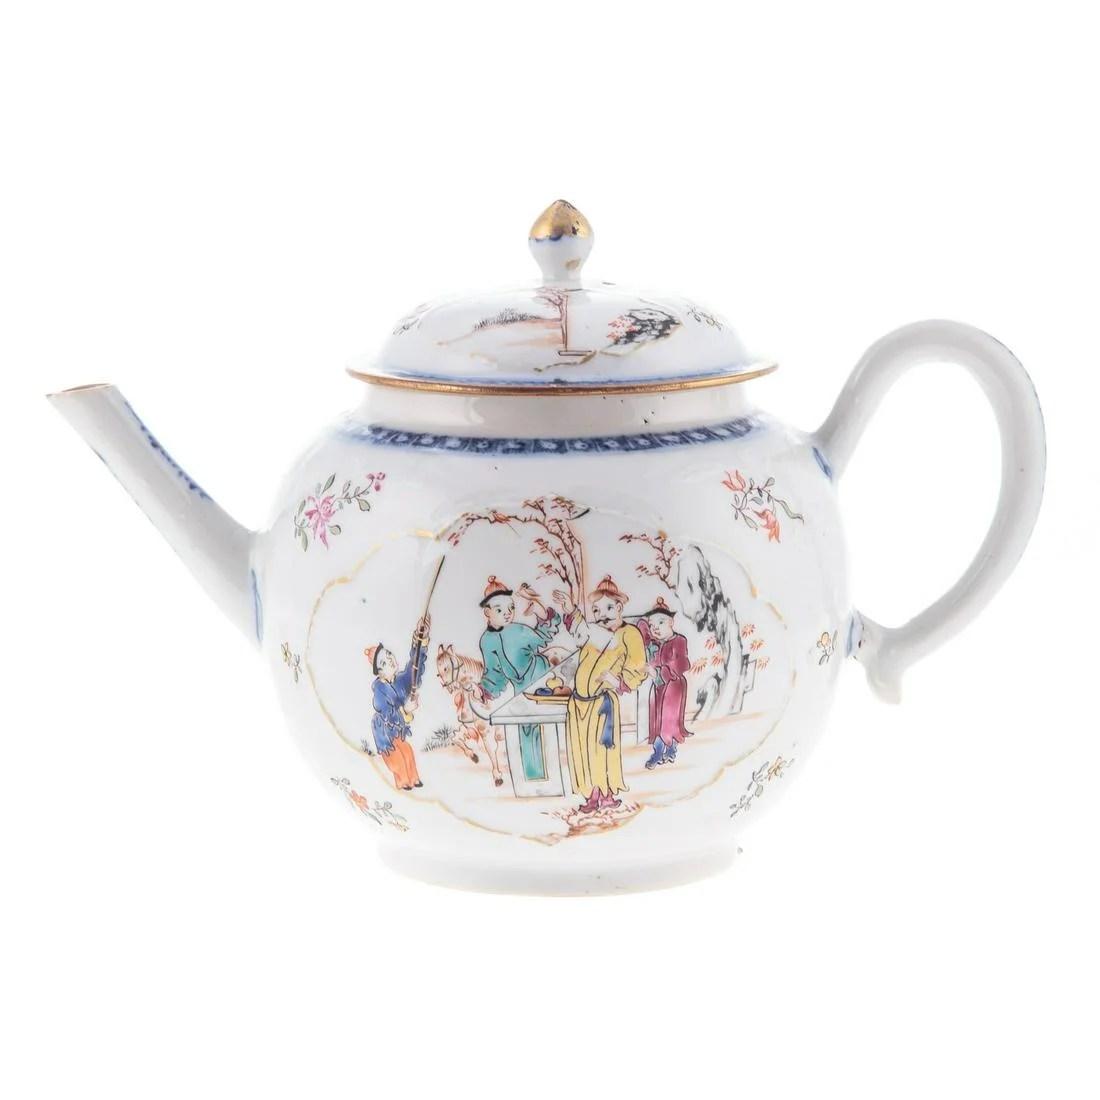 Chinese Export Mandarin Globular Teapot